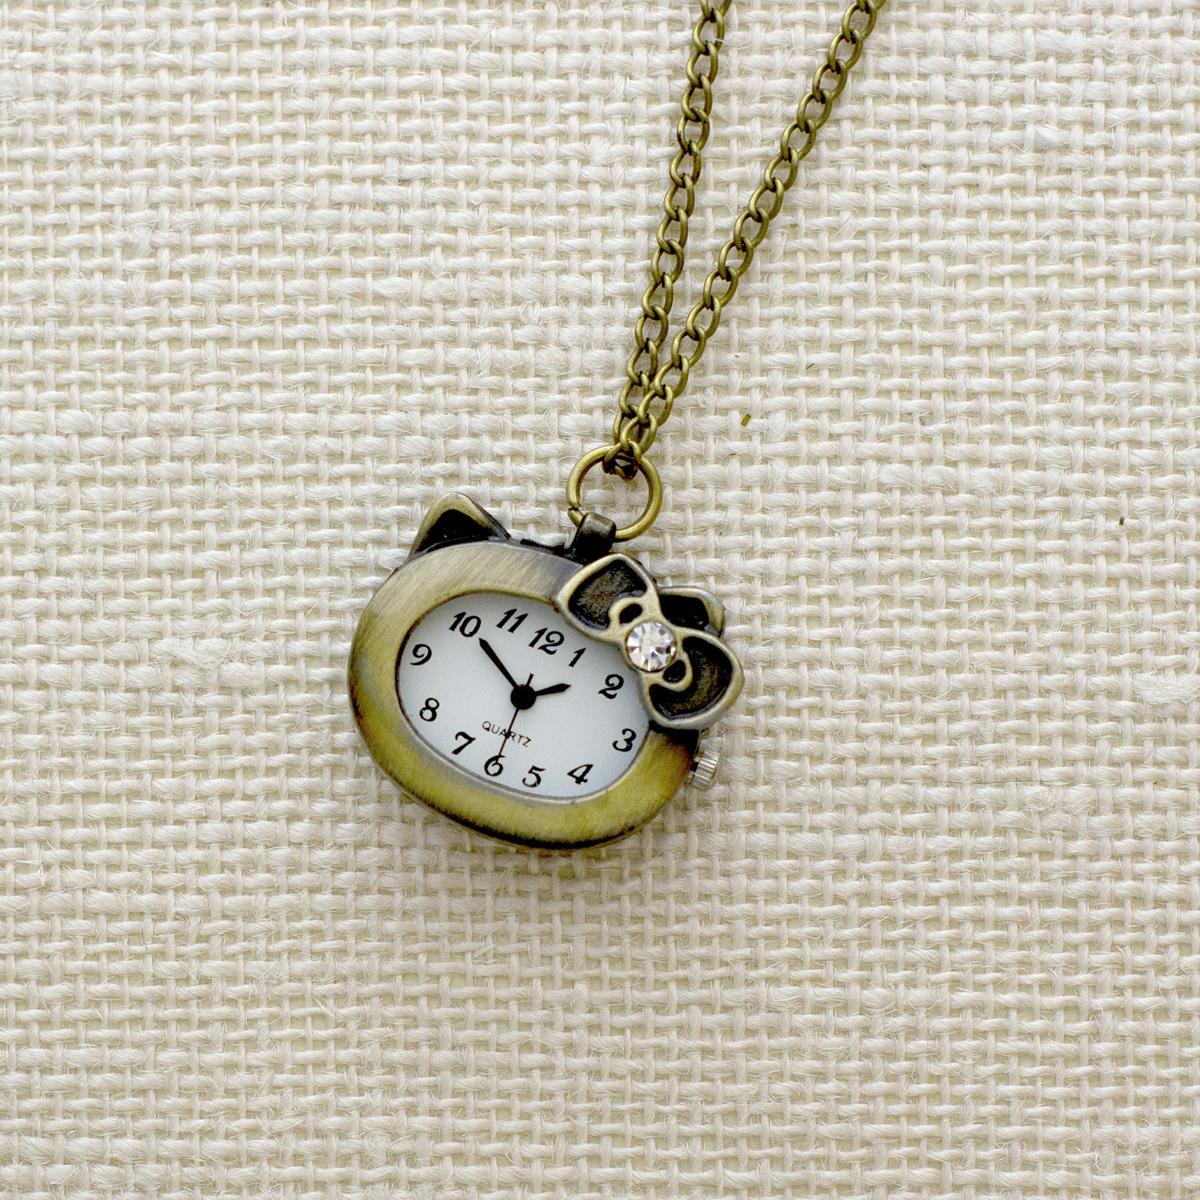 Кулон-часы Милая Китти. ANTIK-165 ( ANTIK-165 )